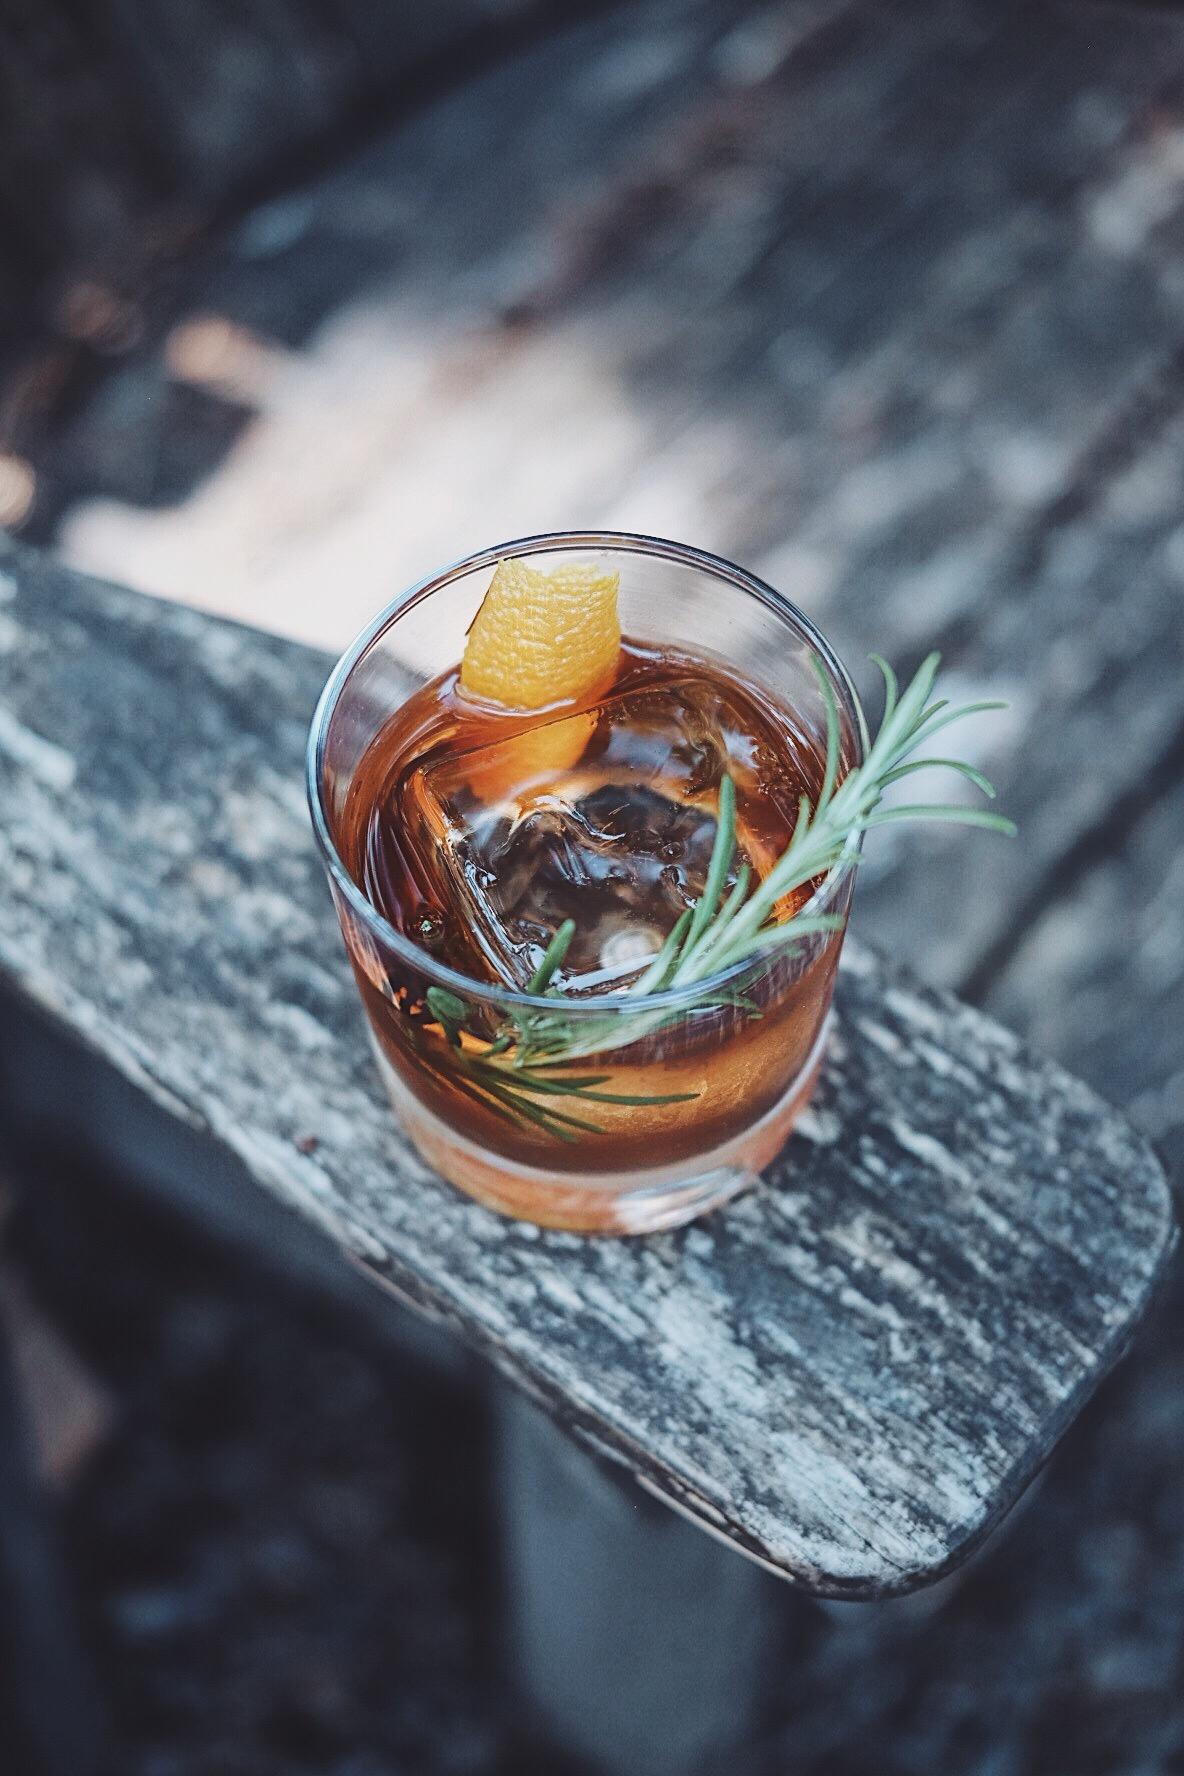 ingredients: - 1 1/2 oz aged rum1/2 oz Alpine liqueur1 tsp Demerara syrup1 dash aromatic bitters2 dash chocolate bittersGarnish: Orange peel & rosemary